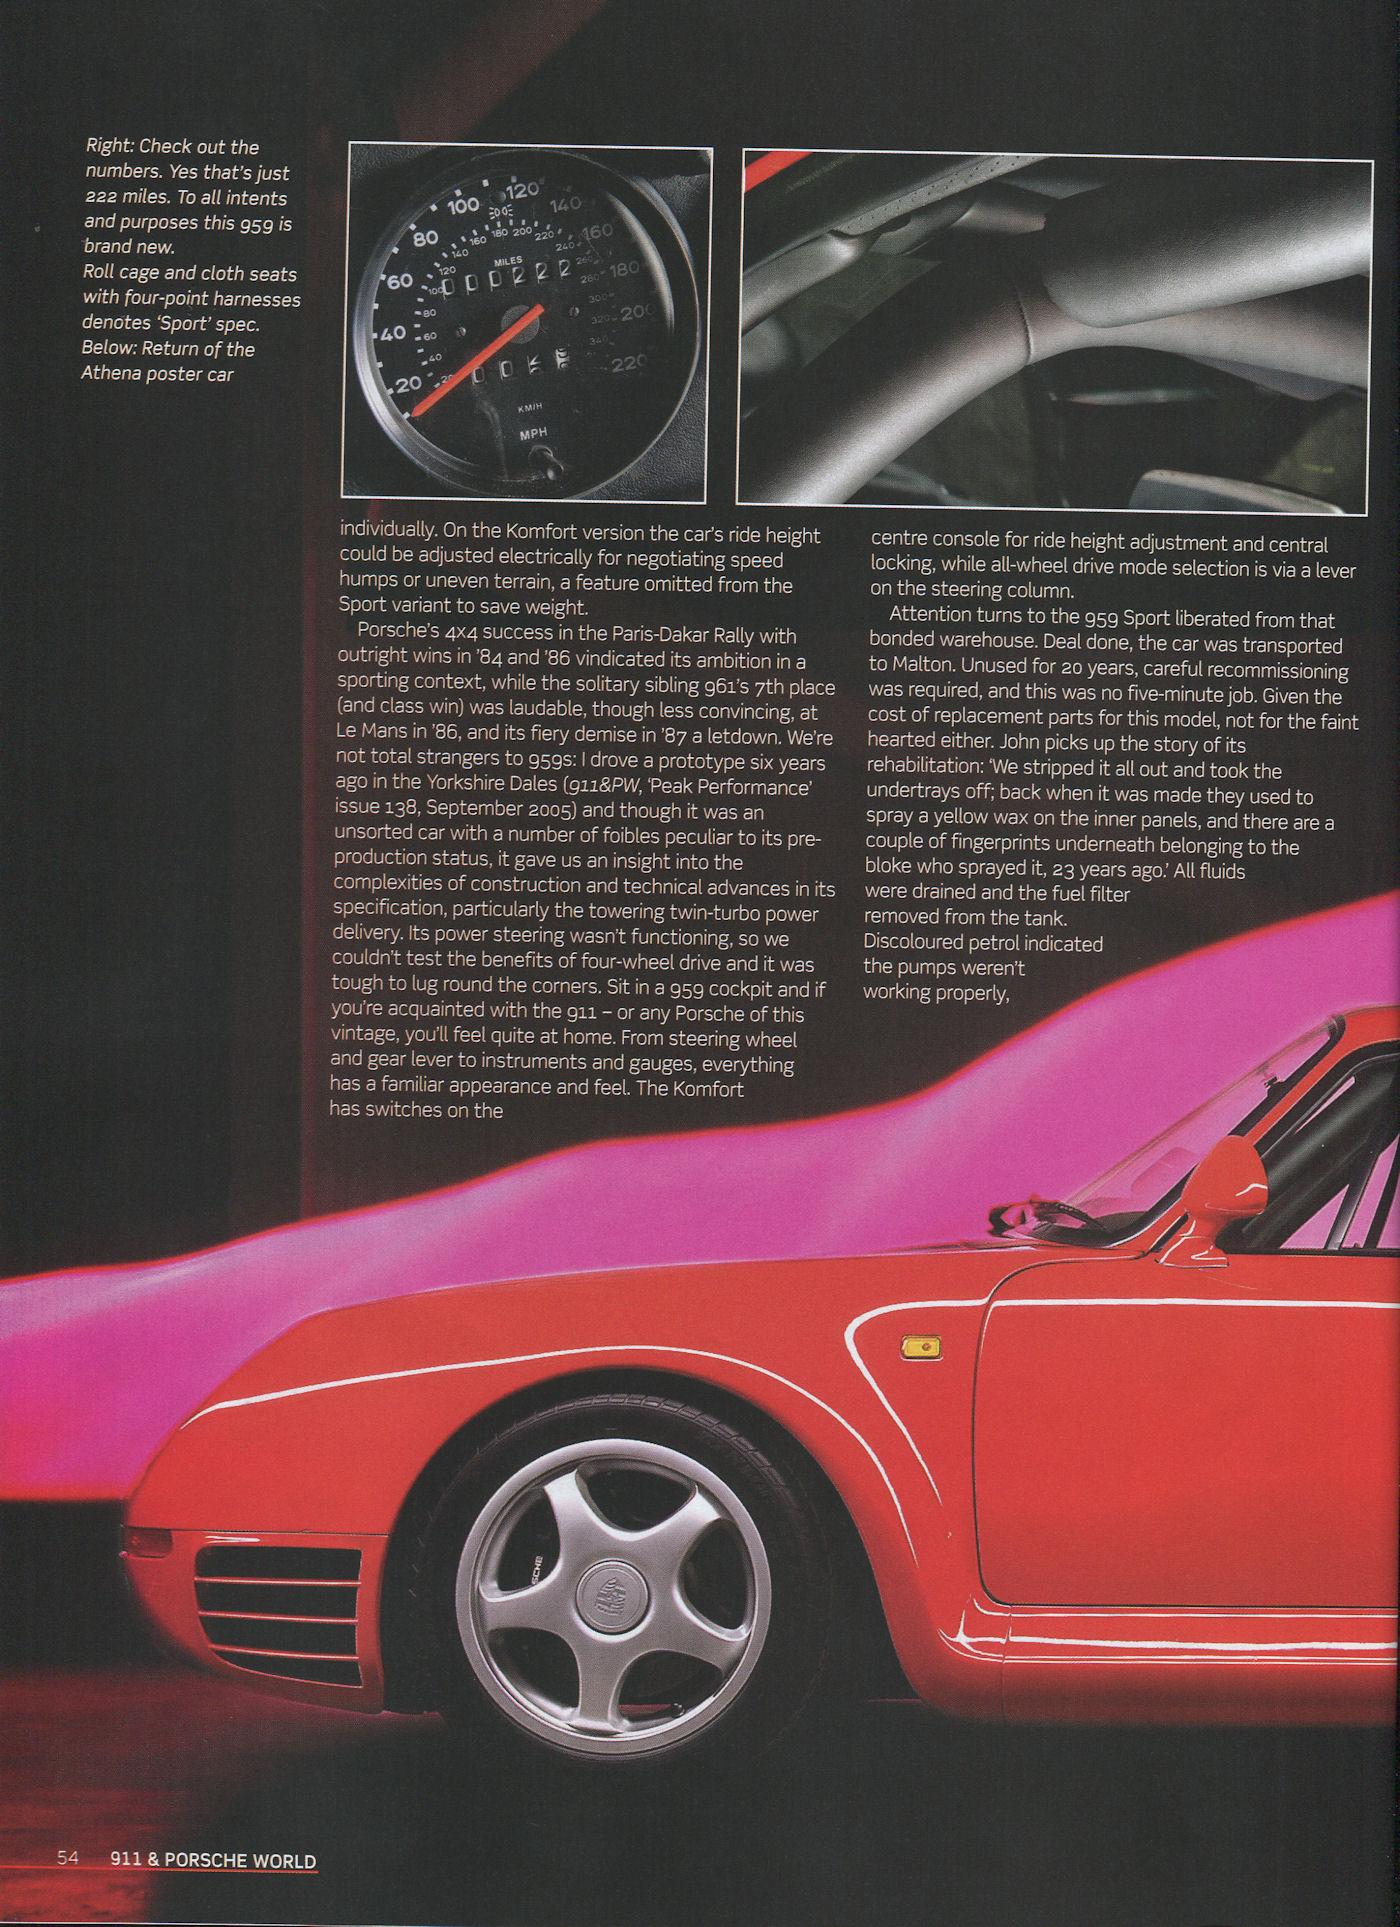 Porsche 959 911 Amp Porsche World Mag Porsche Cars History